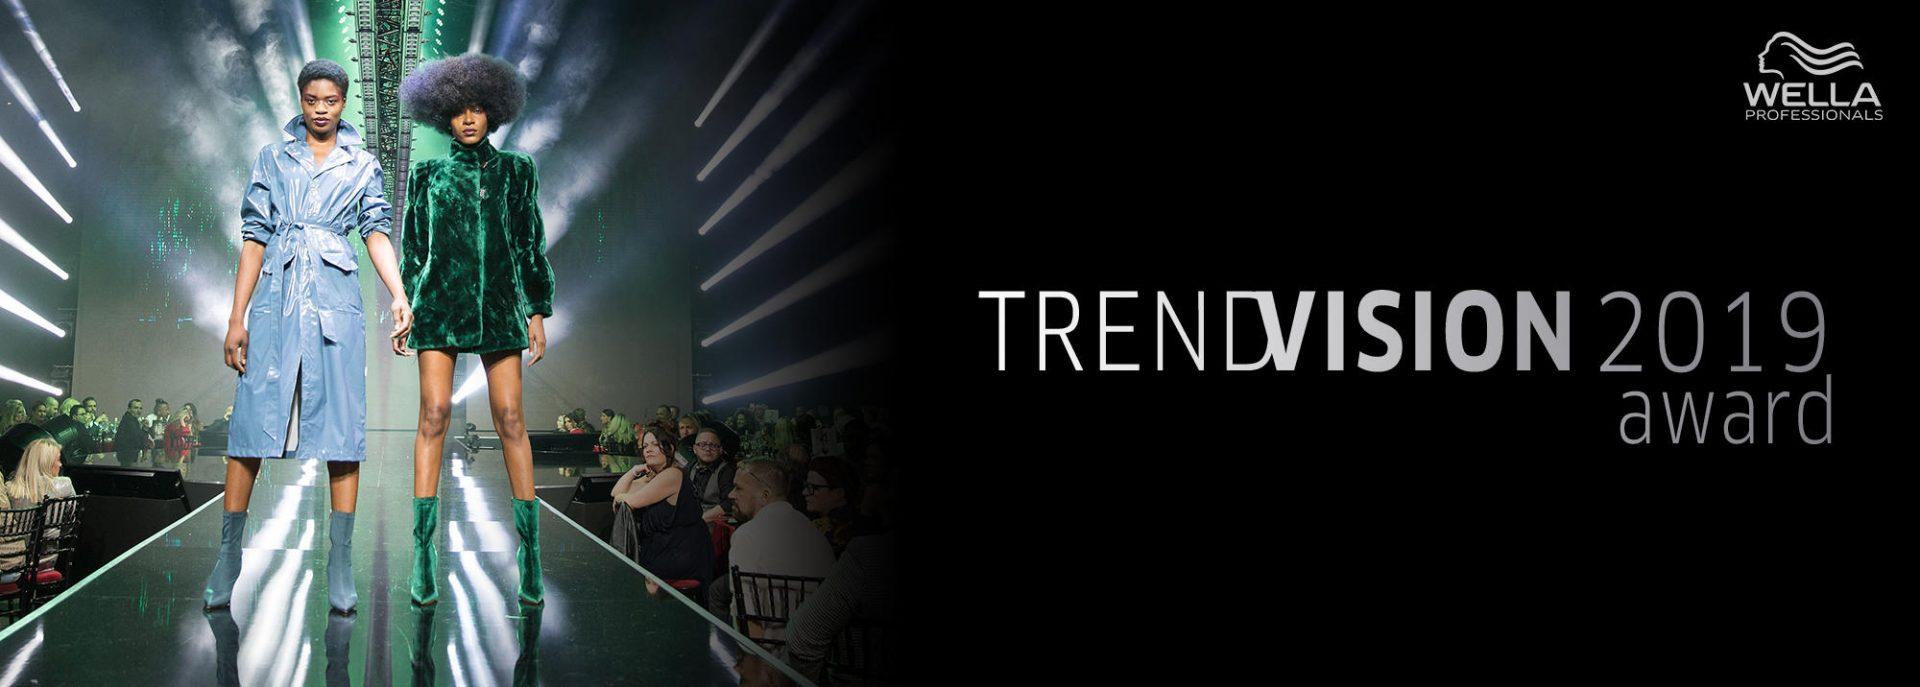 trendvision banner 2019 1 d